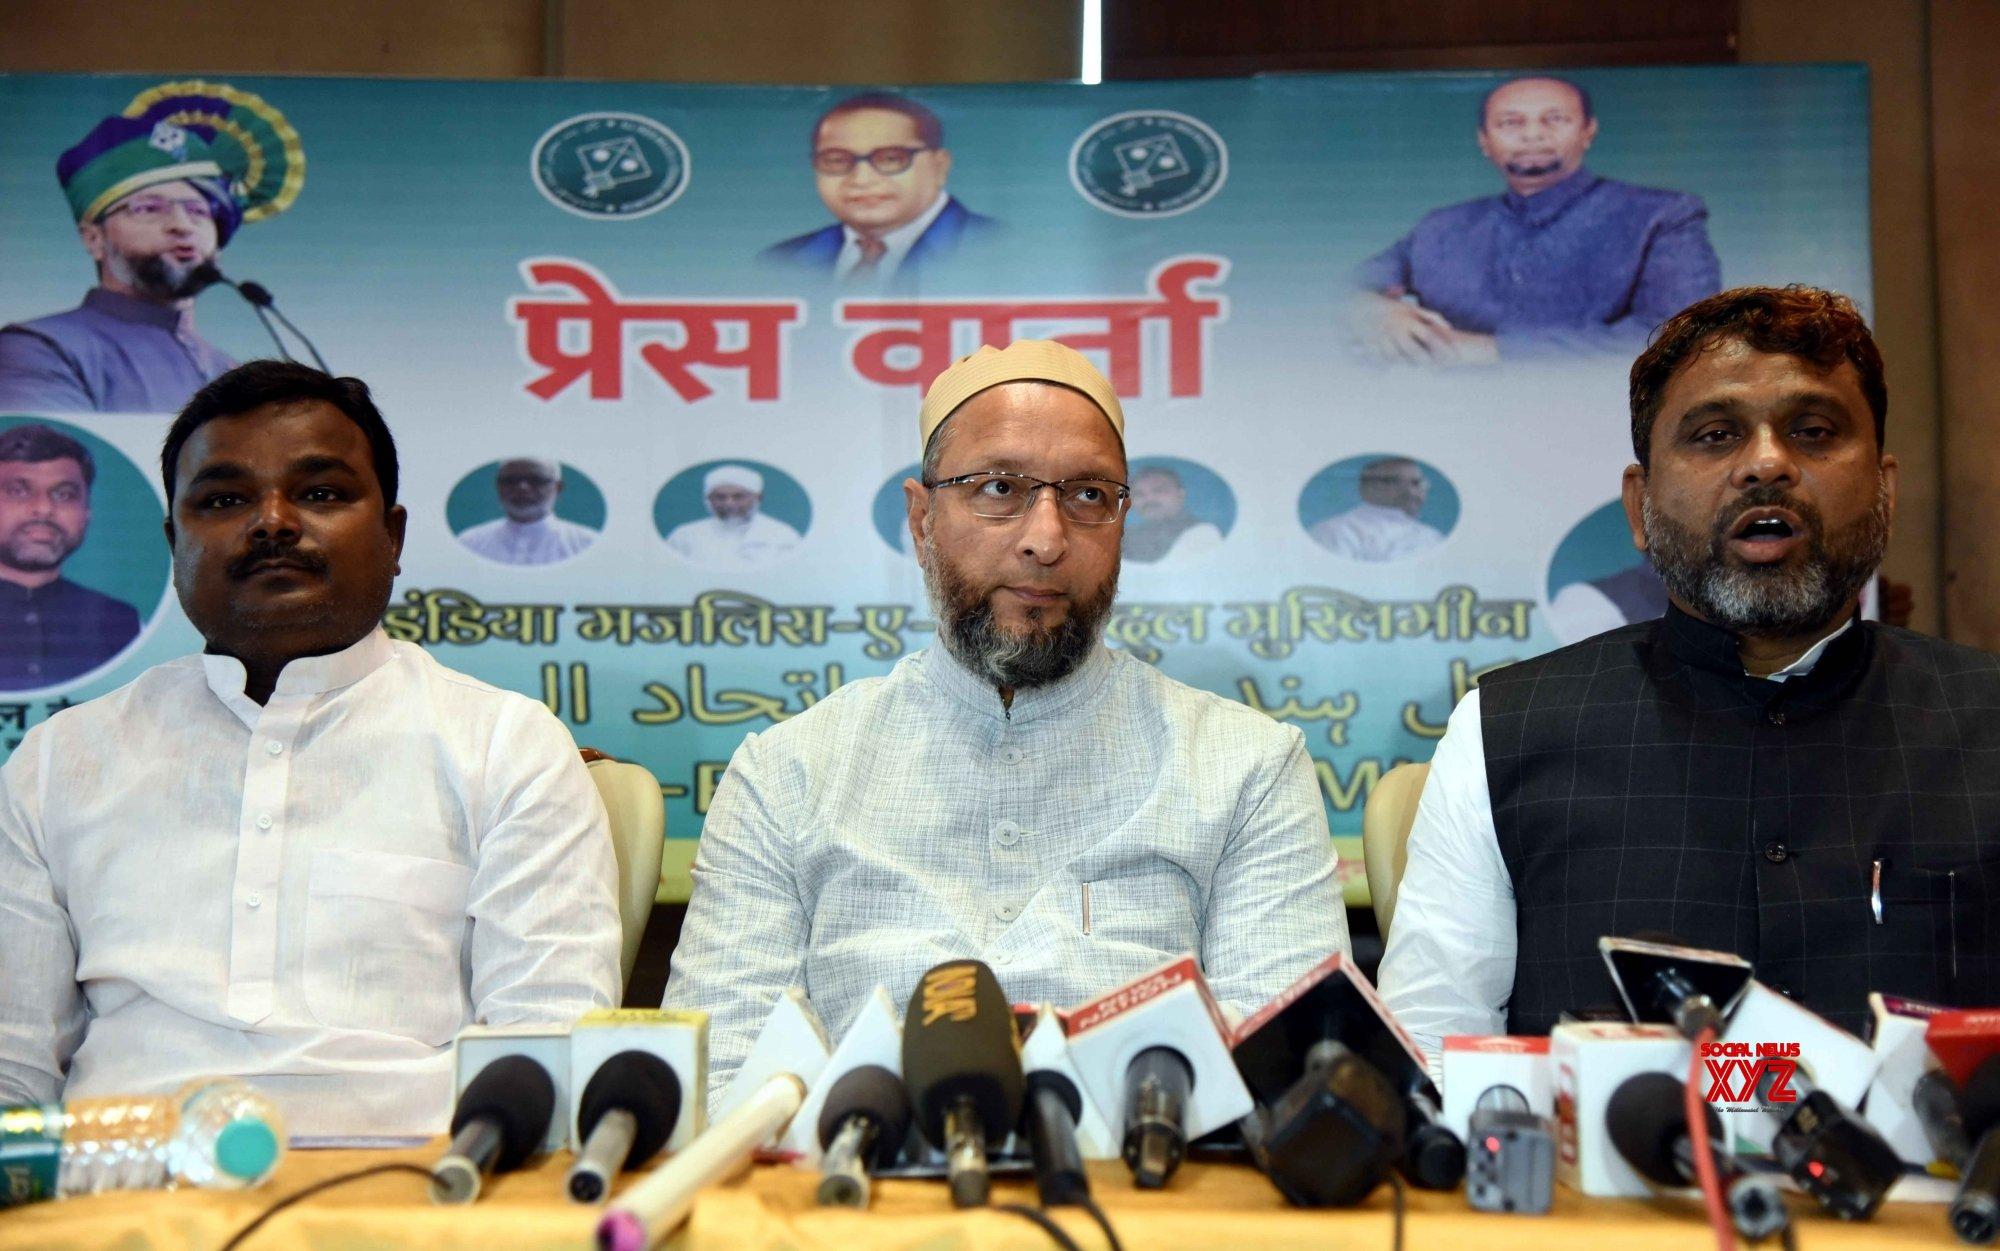 Patna: AIMIM President Asaduddin Owaisi addressing a press conference in Patna. #Gallery